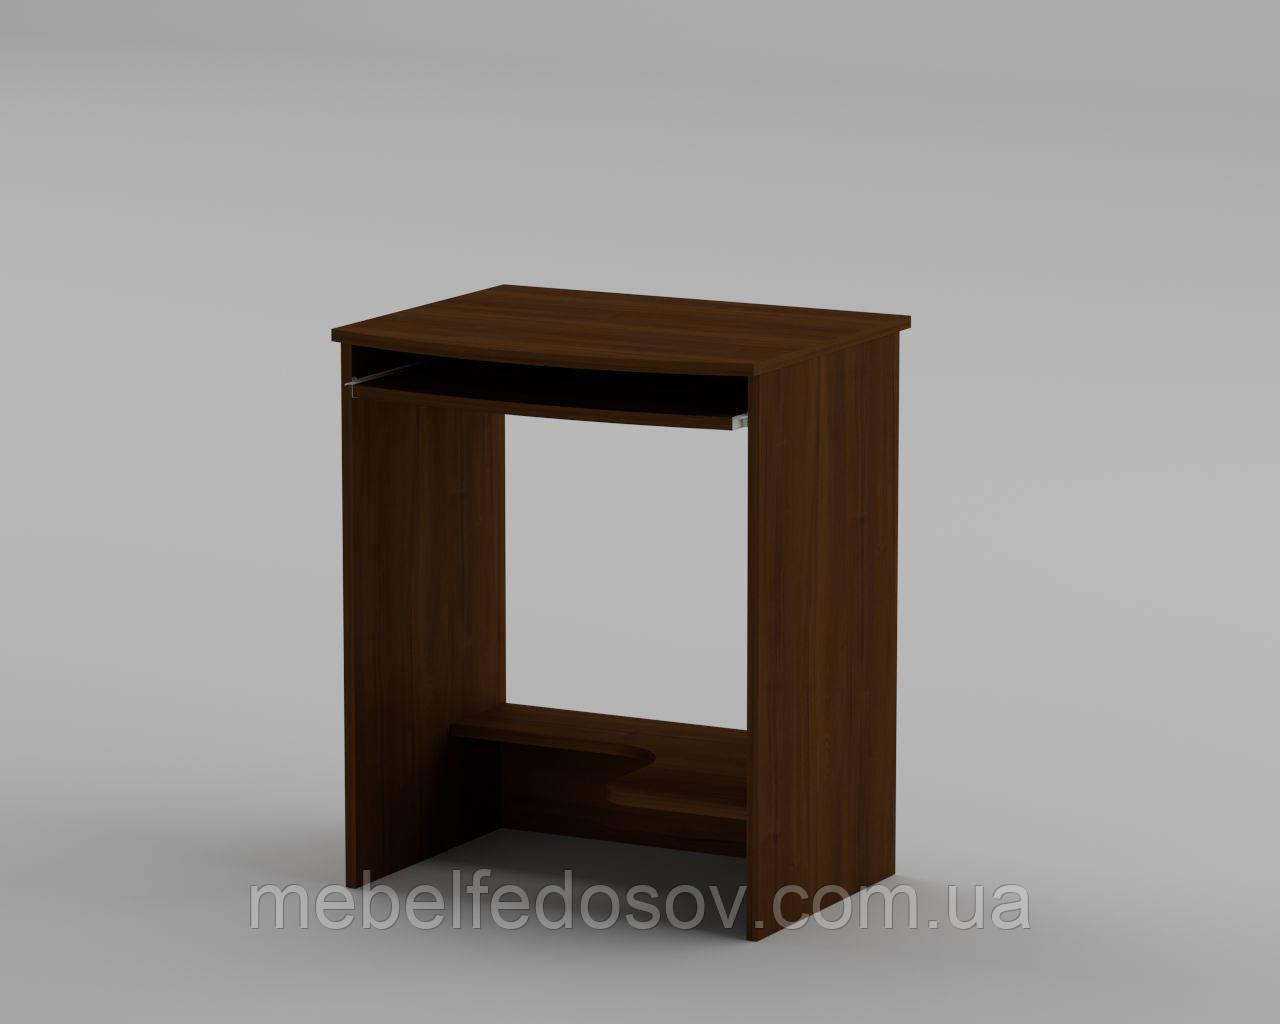 Стол компьютерный СКМ-13  МИНИ (Компанит) 604х500х736мм